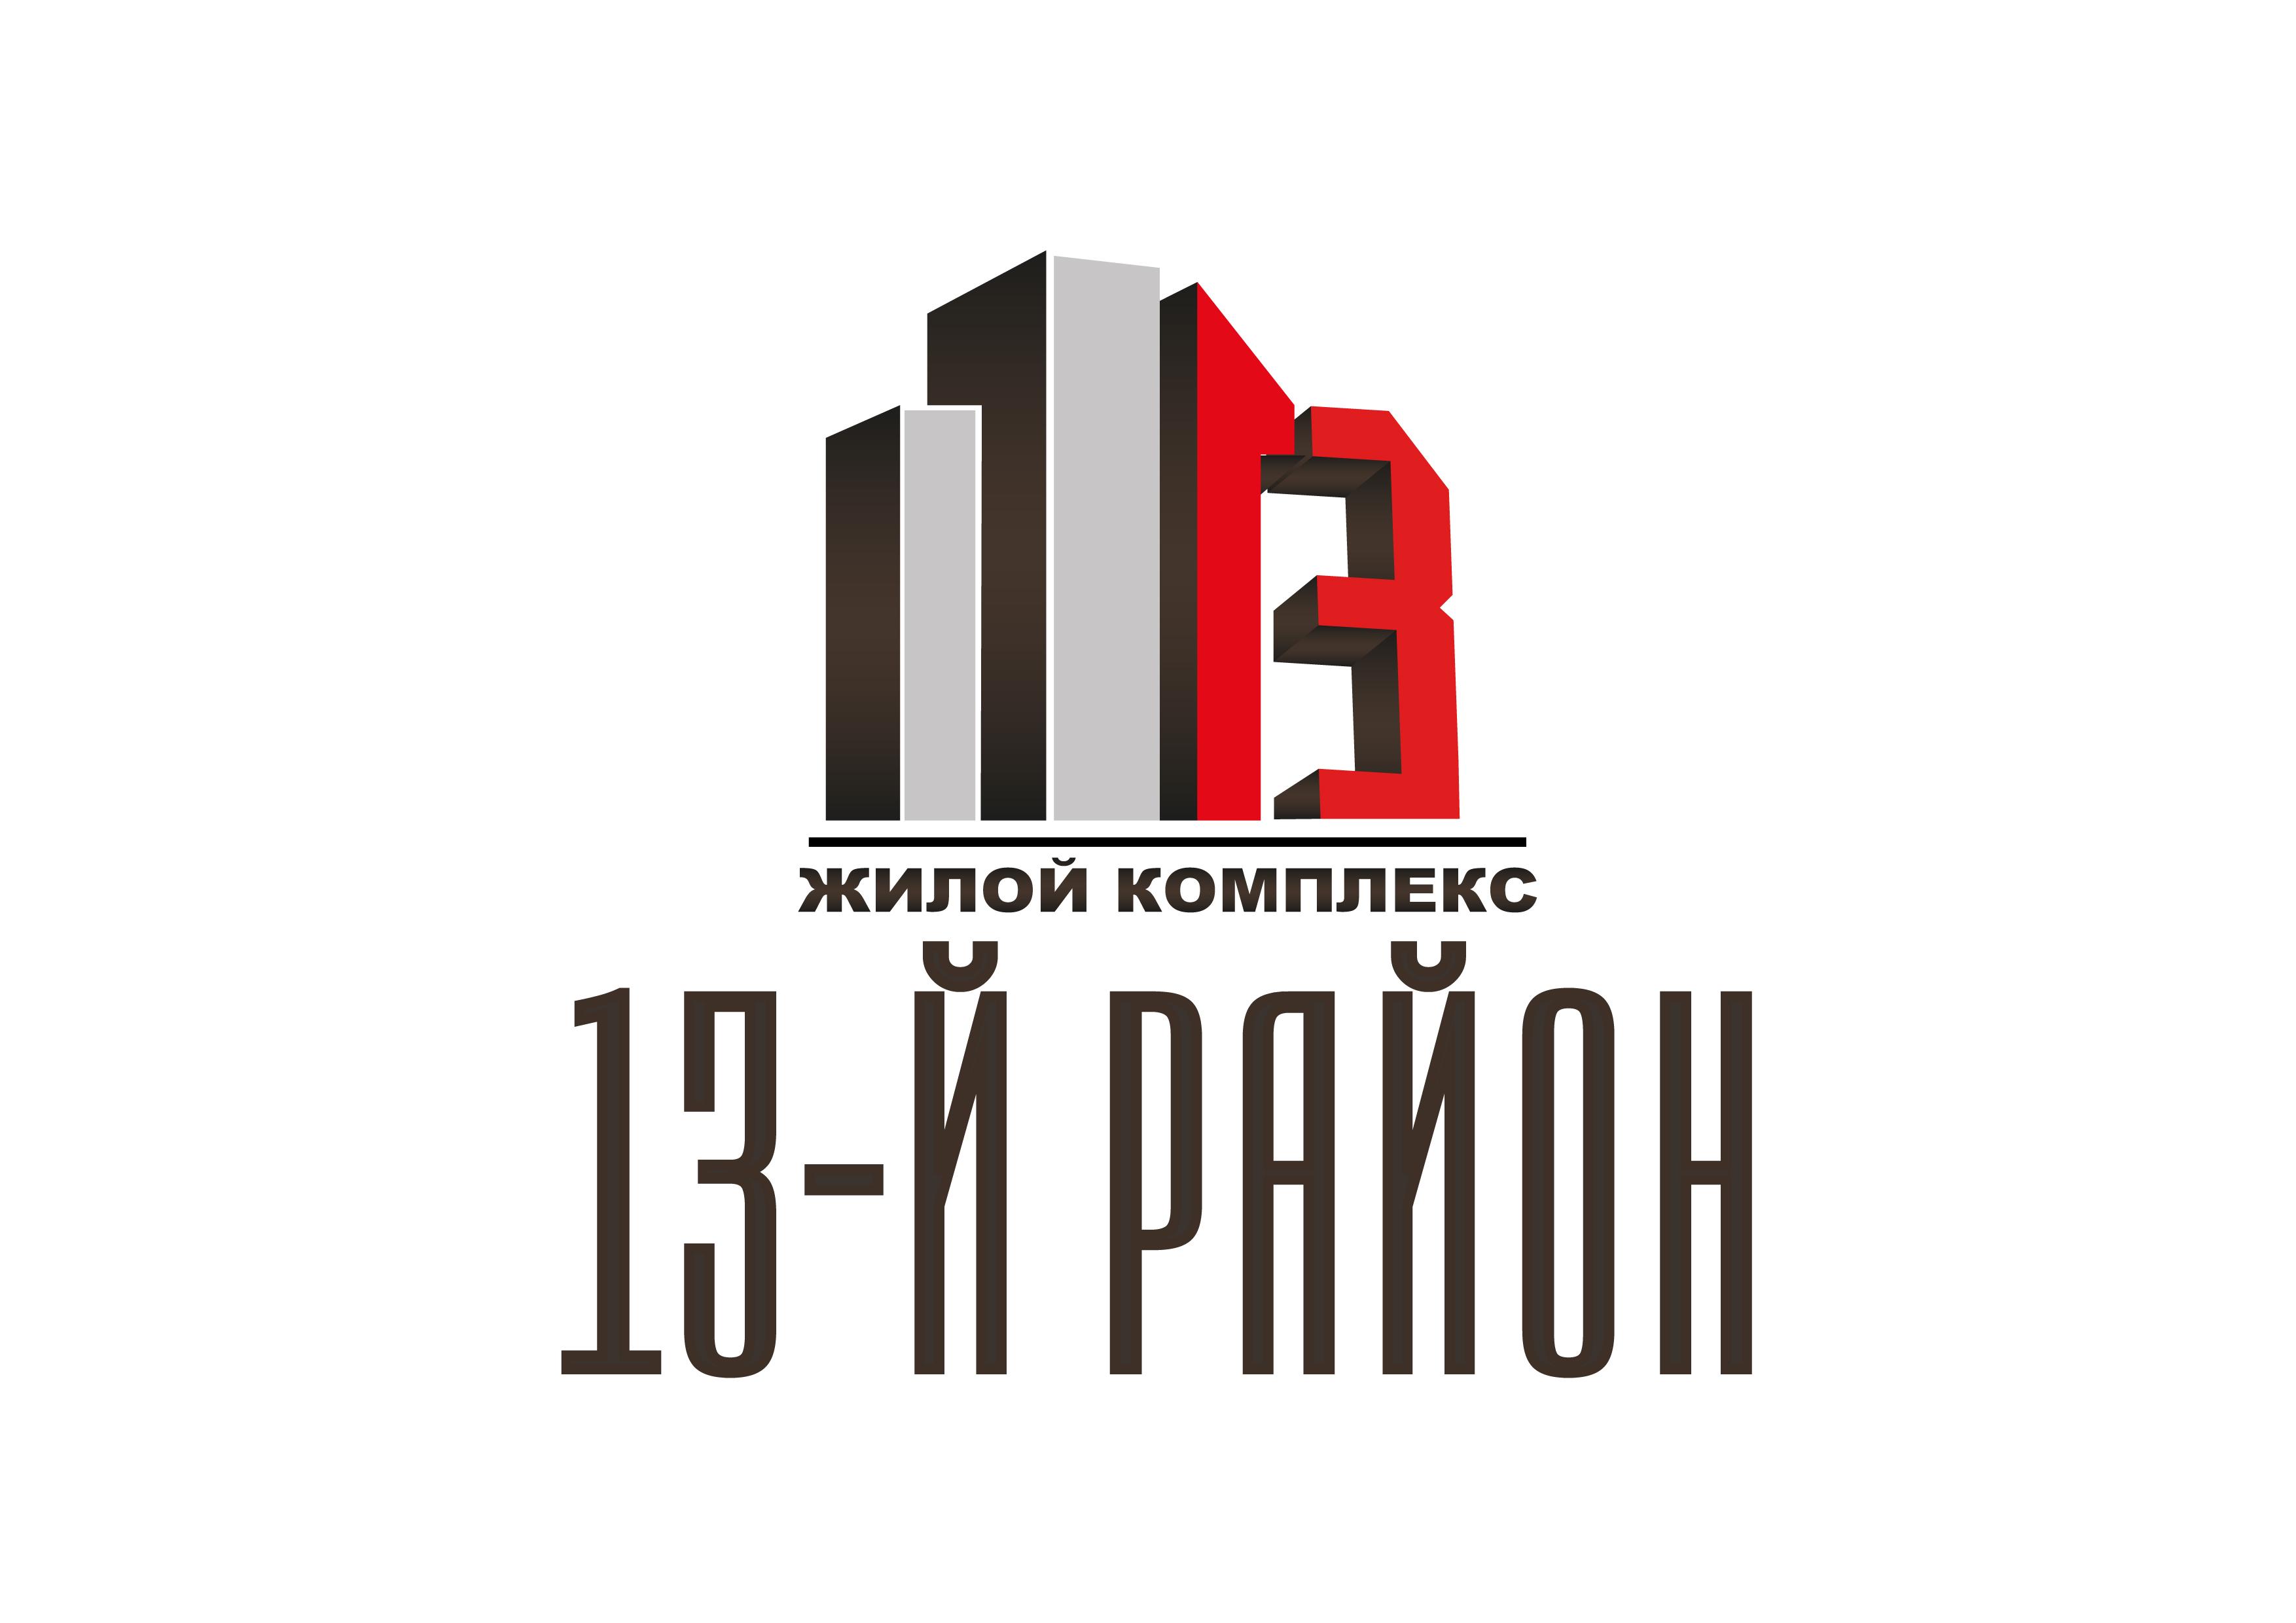 Разработка логотипа и фирменный стиль фото f_742597204c9b9b43.jpg